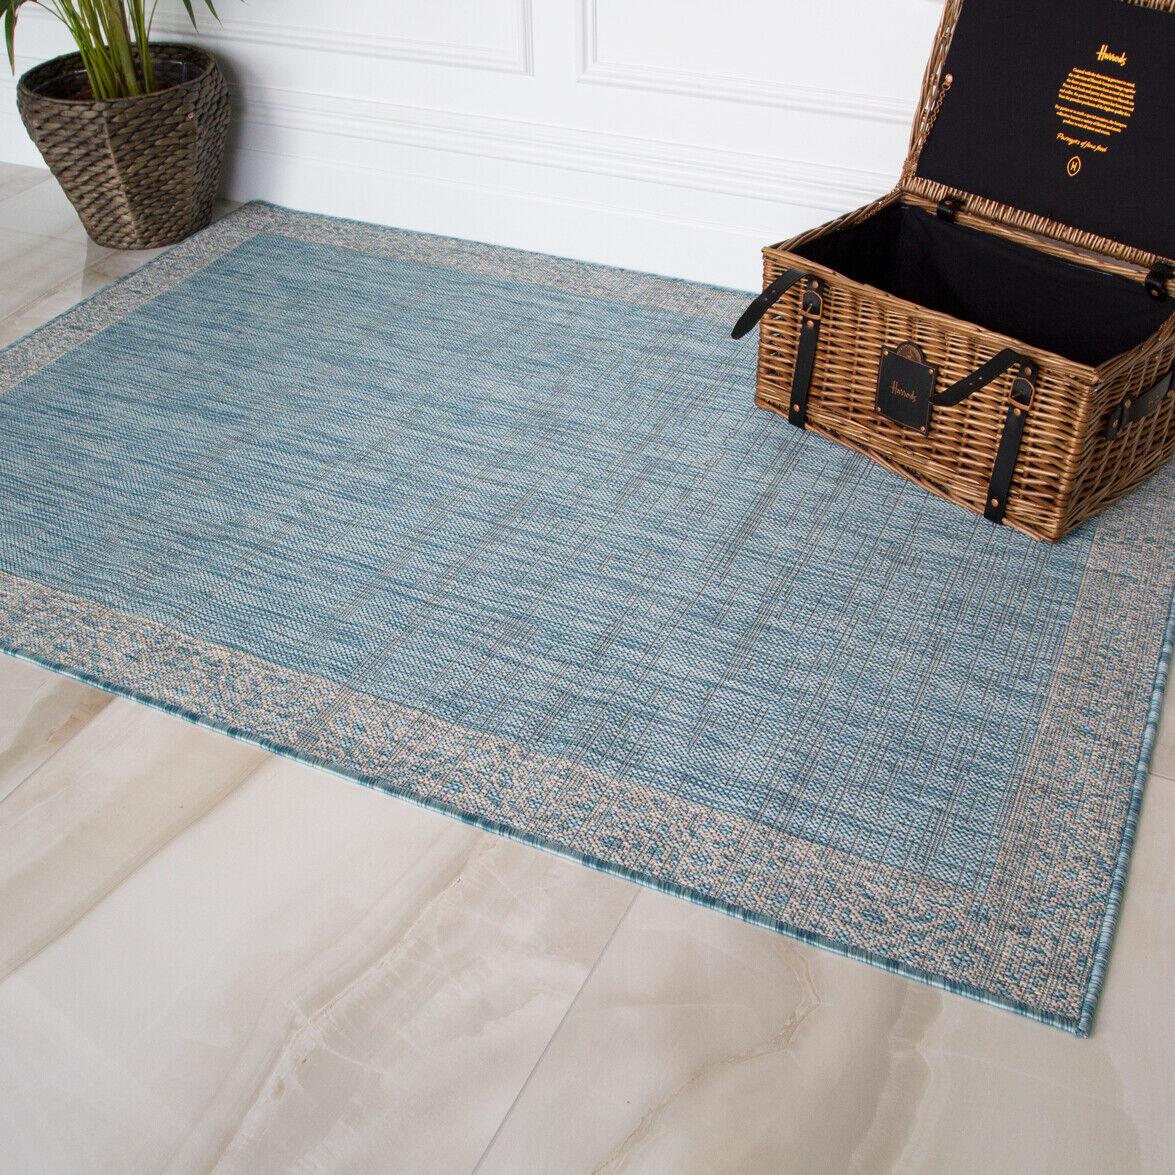 Tradizionale Blu Flatweave Rugs Pet Friendly Lavabile Indoor OUTDOOR Tappeto Area